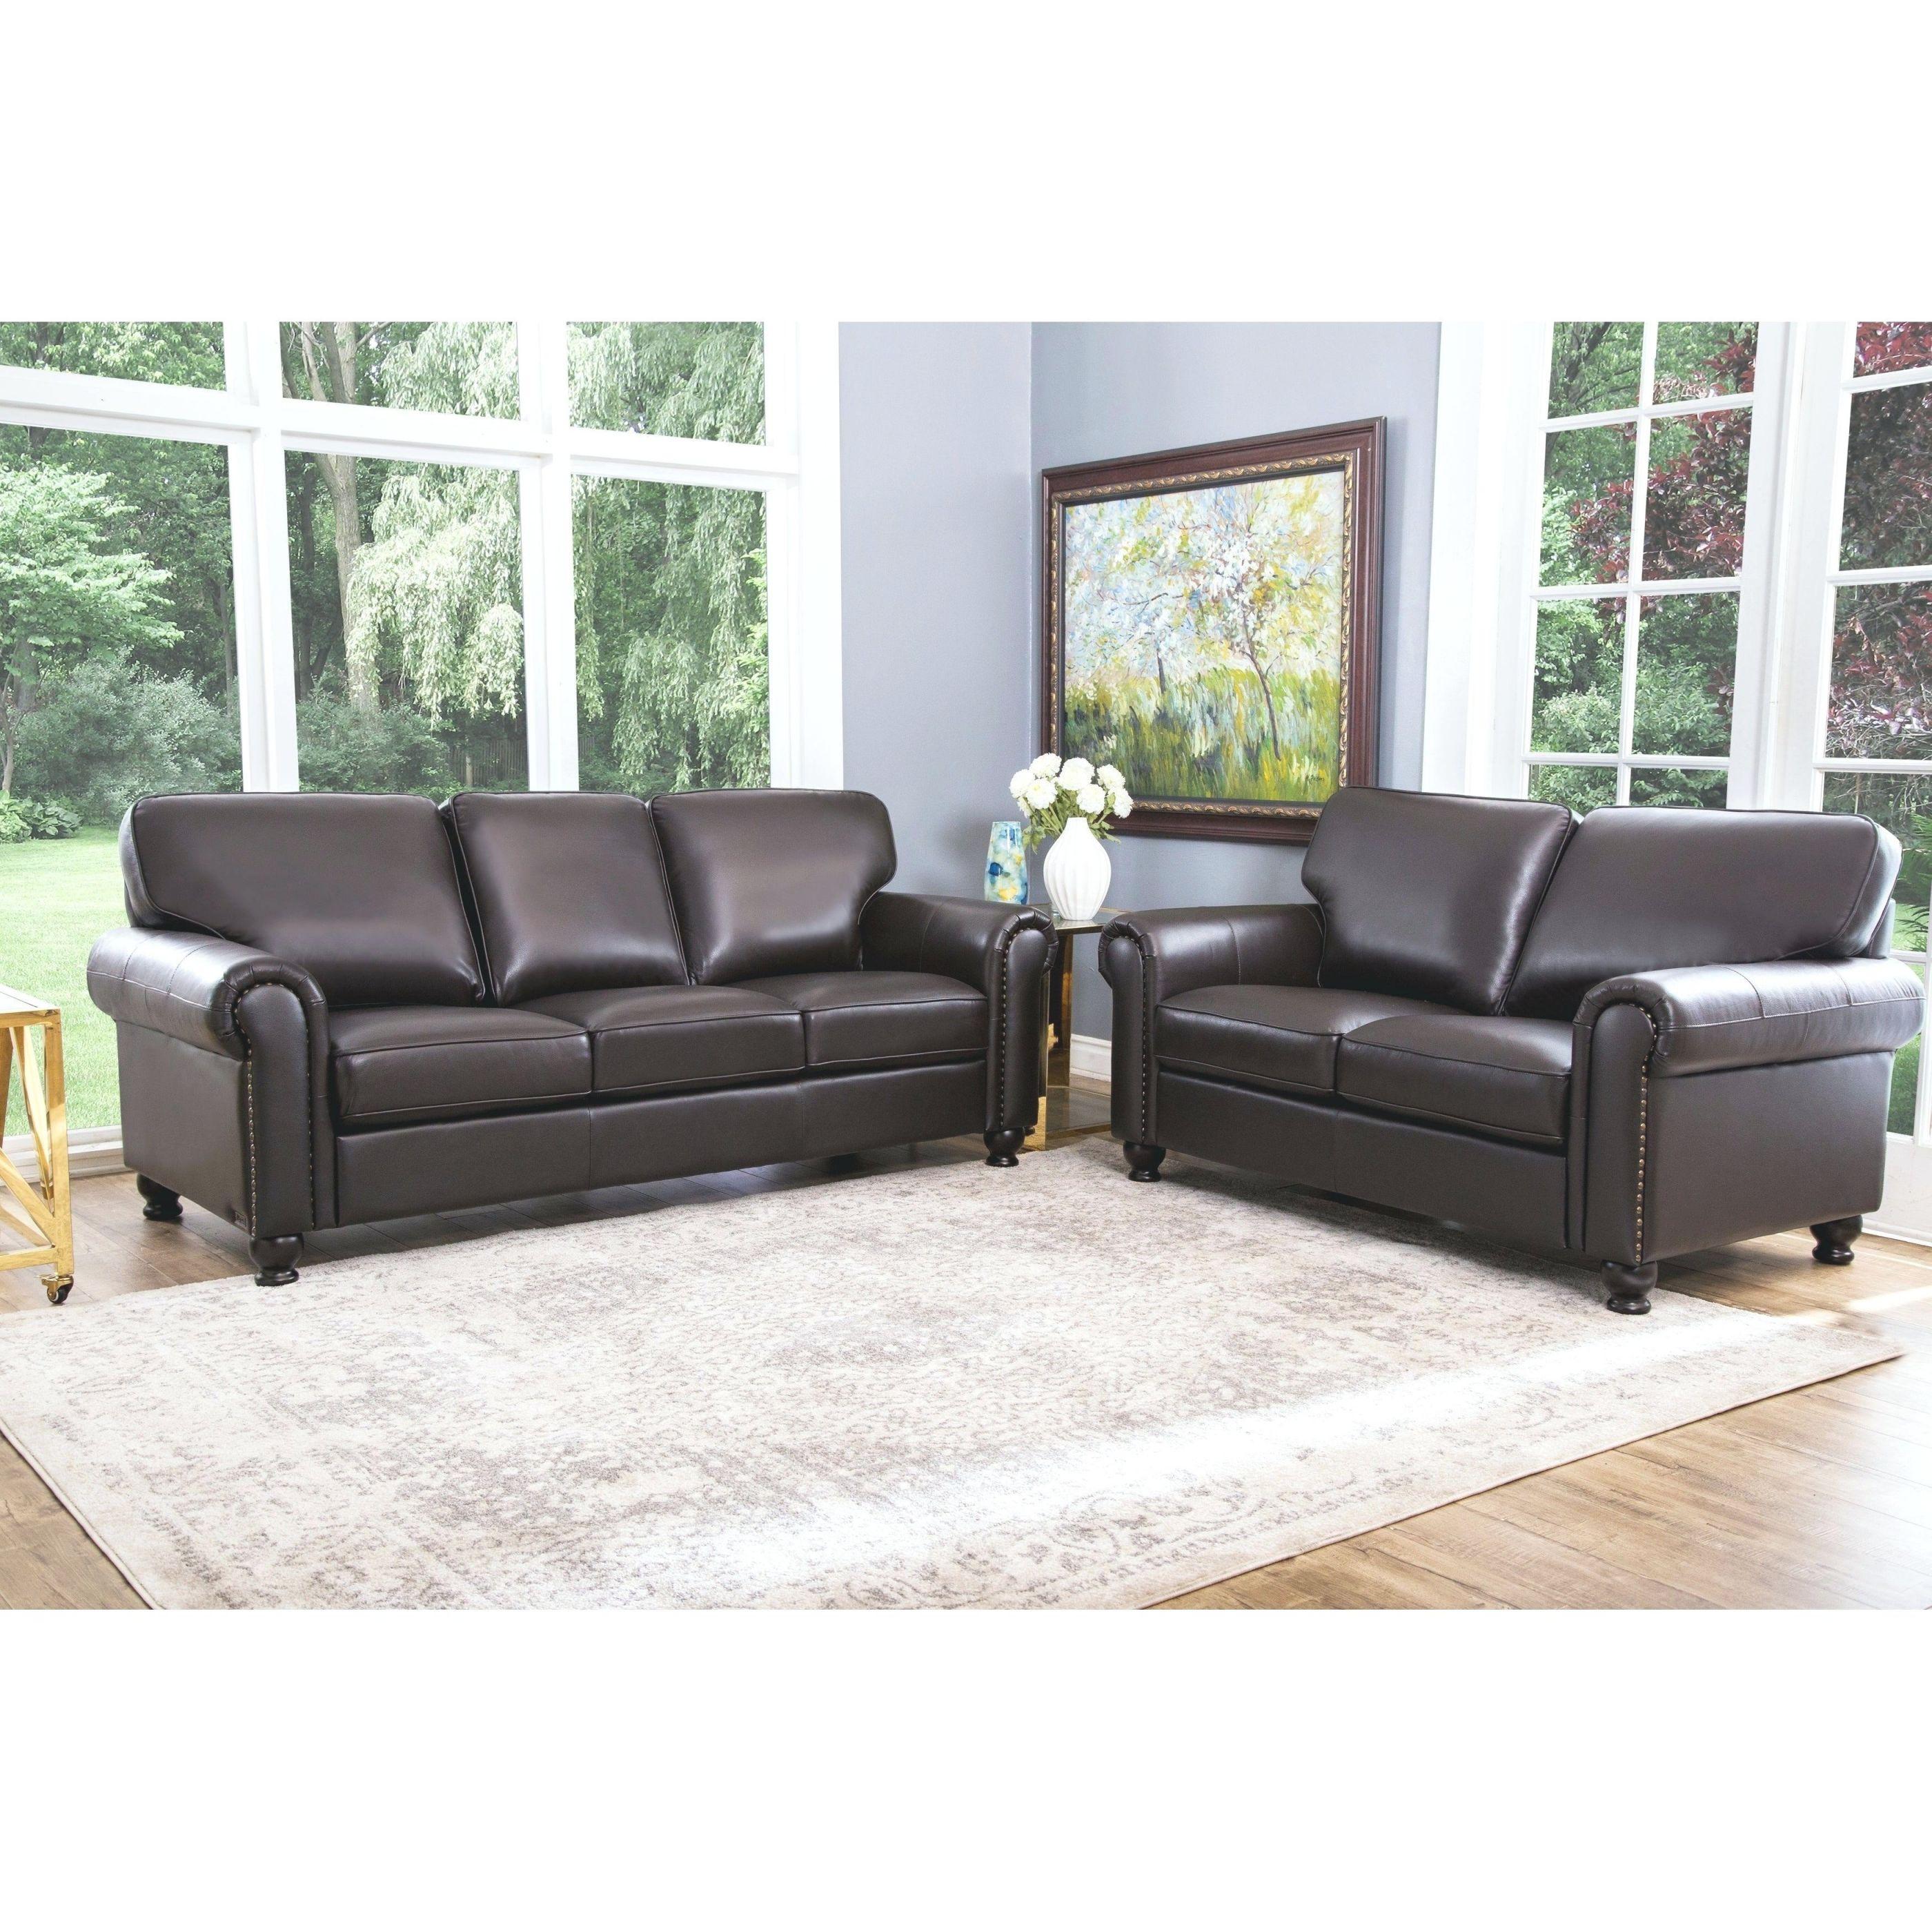 Leather Living Room Furniture Sets – Justdine.co with Living Room Furniture Sets For Sale